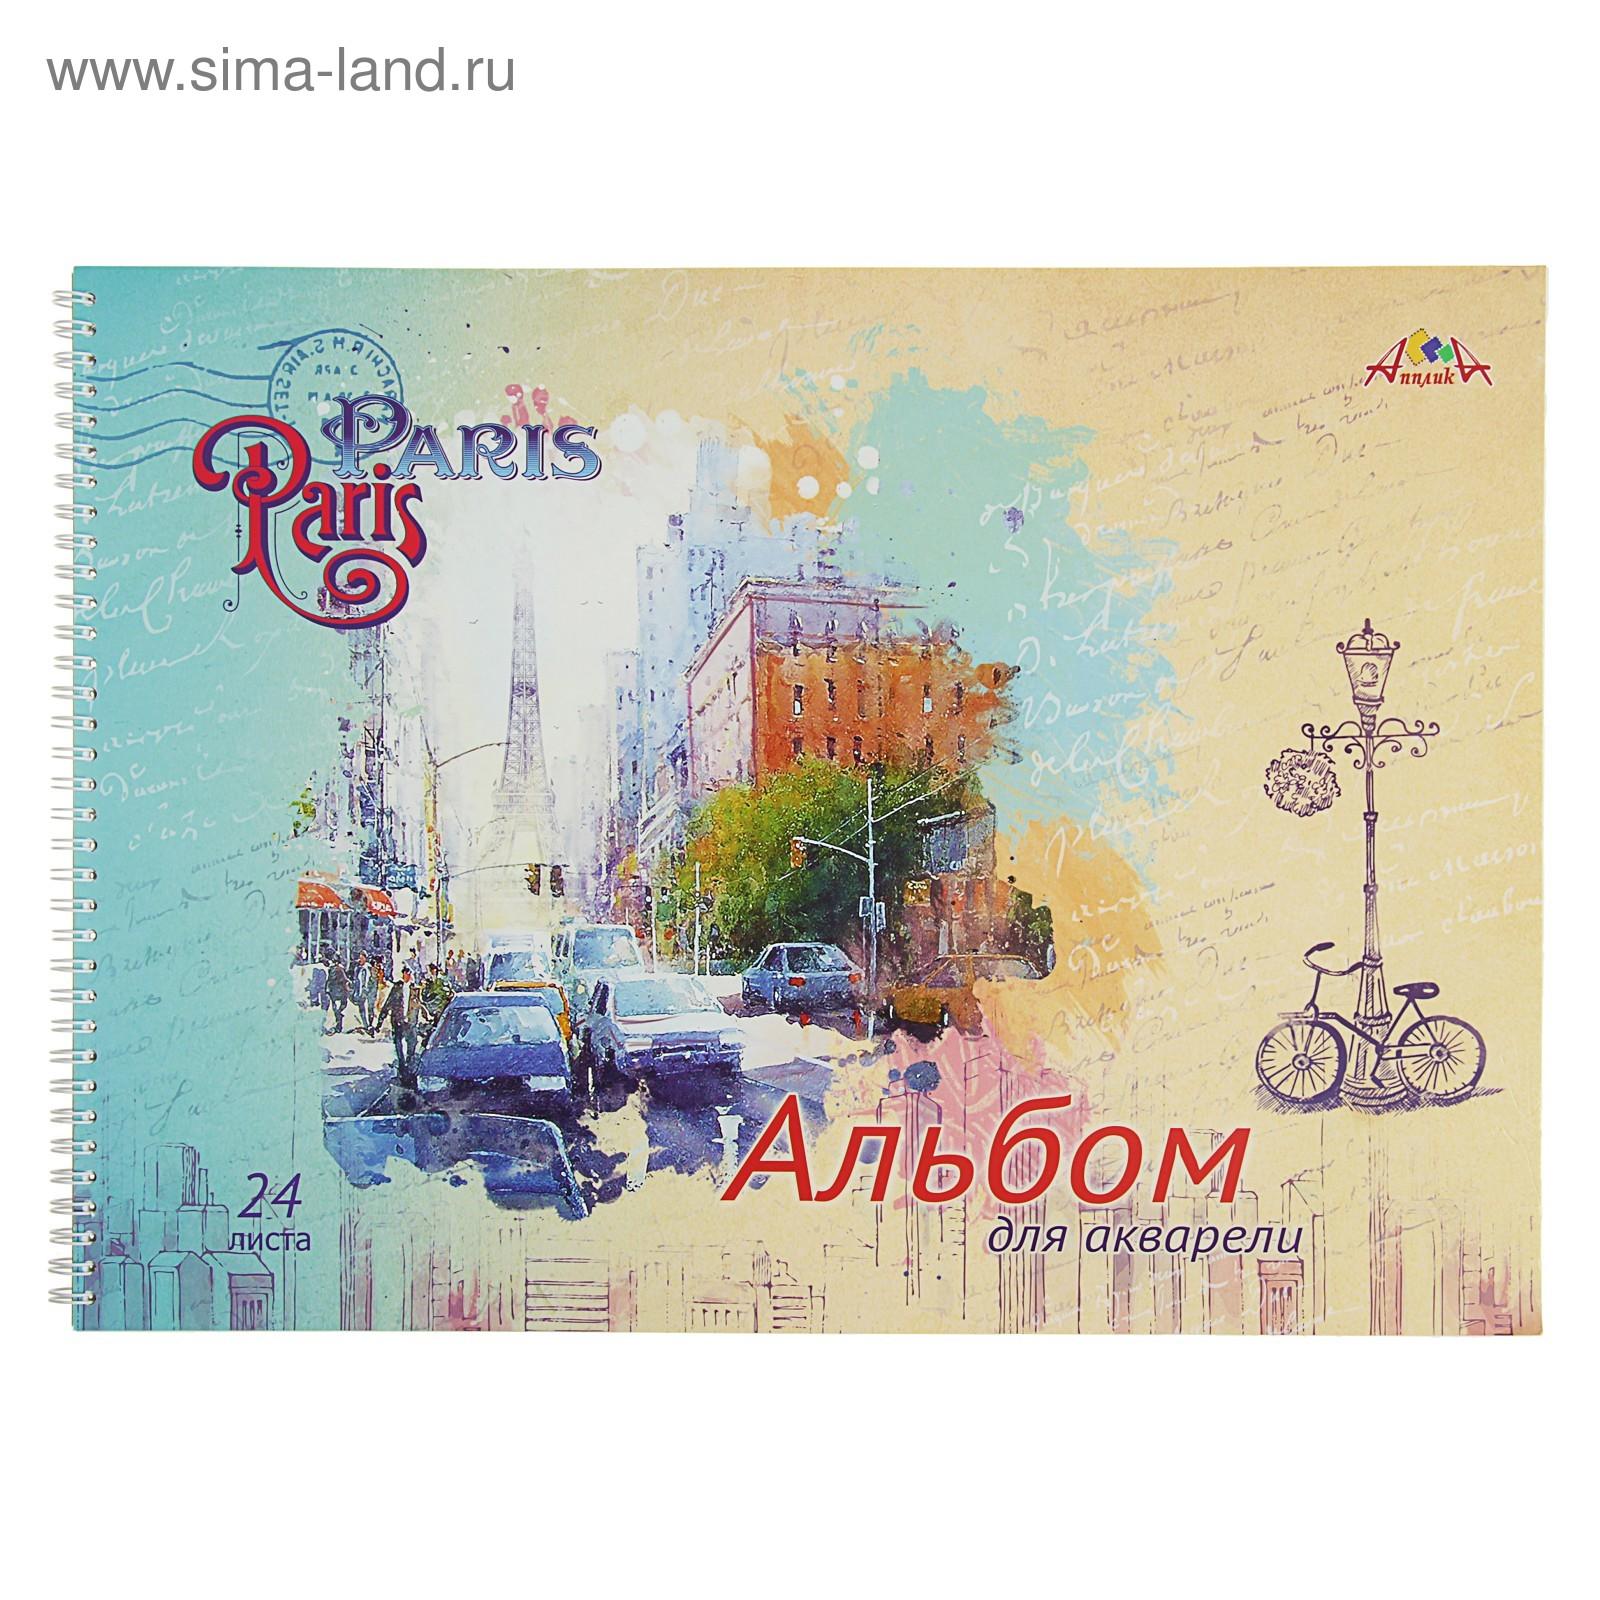 Альбом д/акварели А3 24л спир Париж